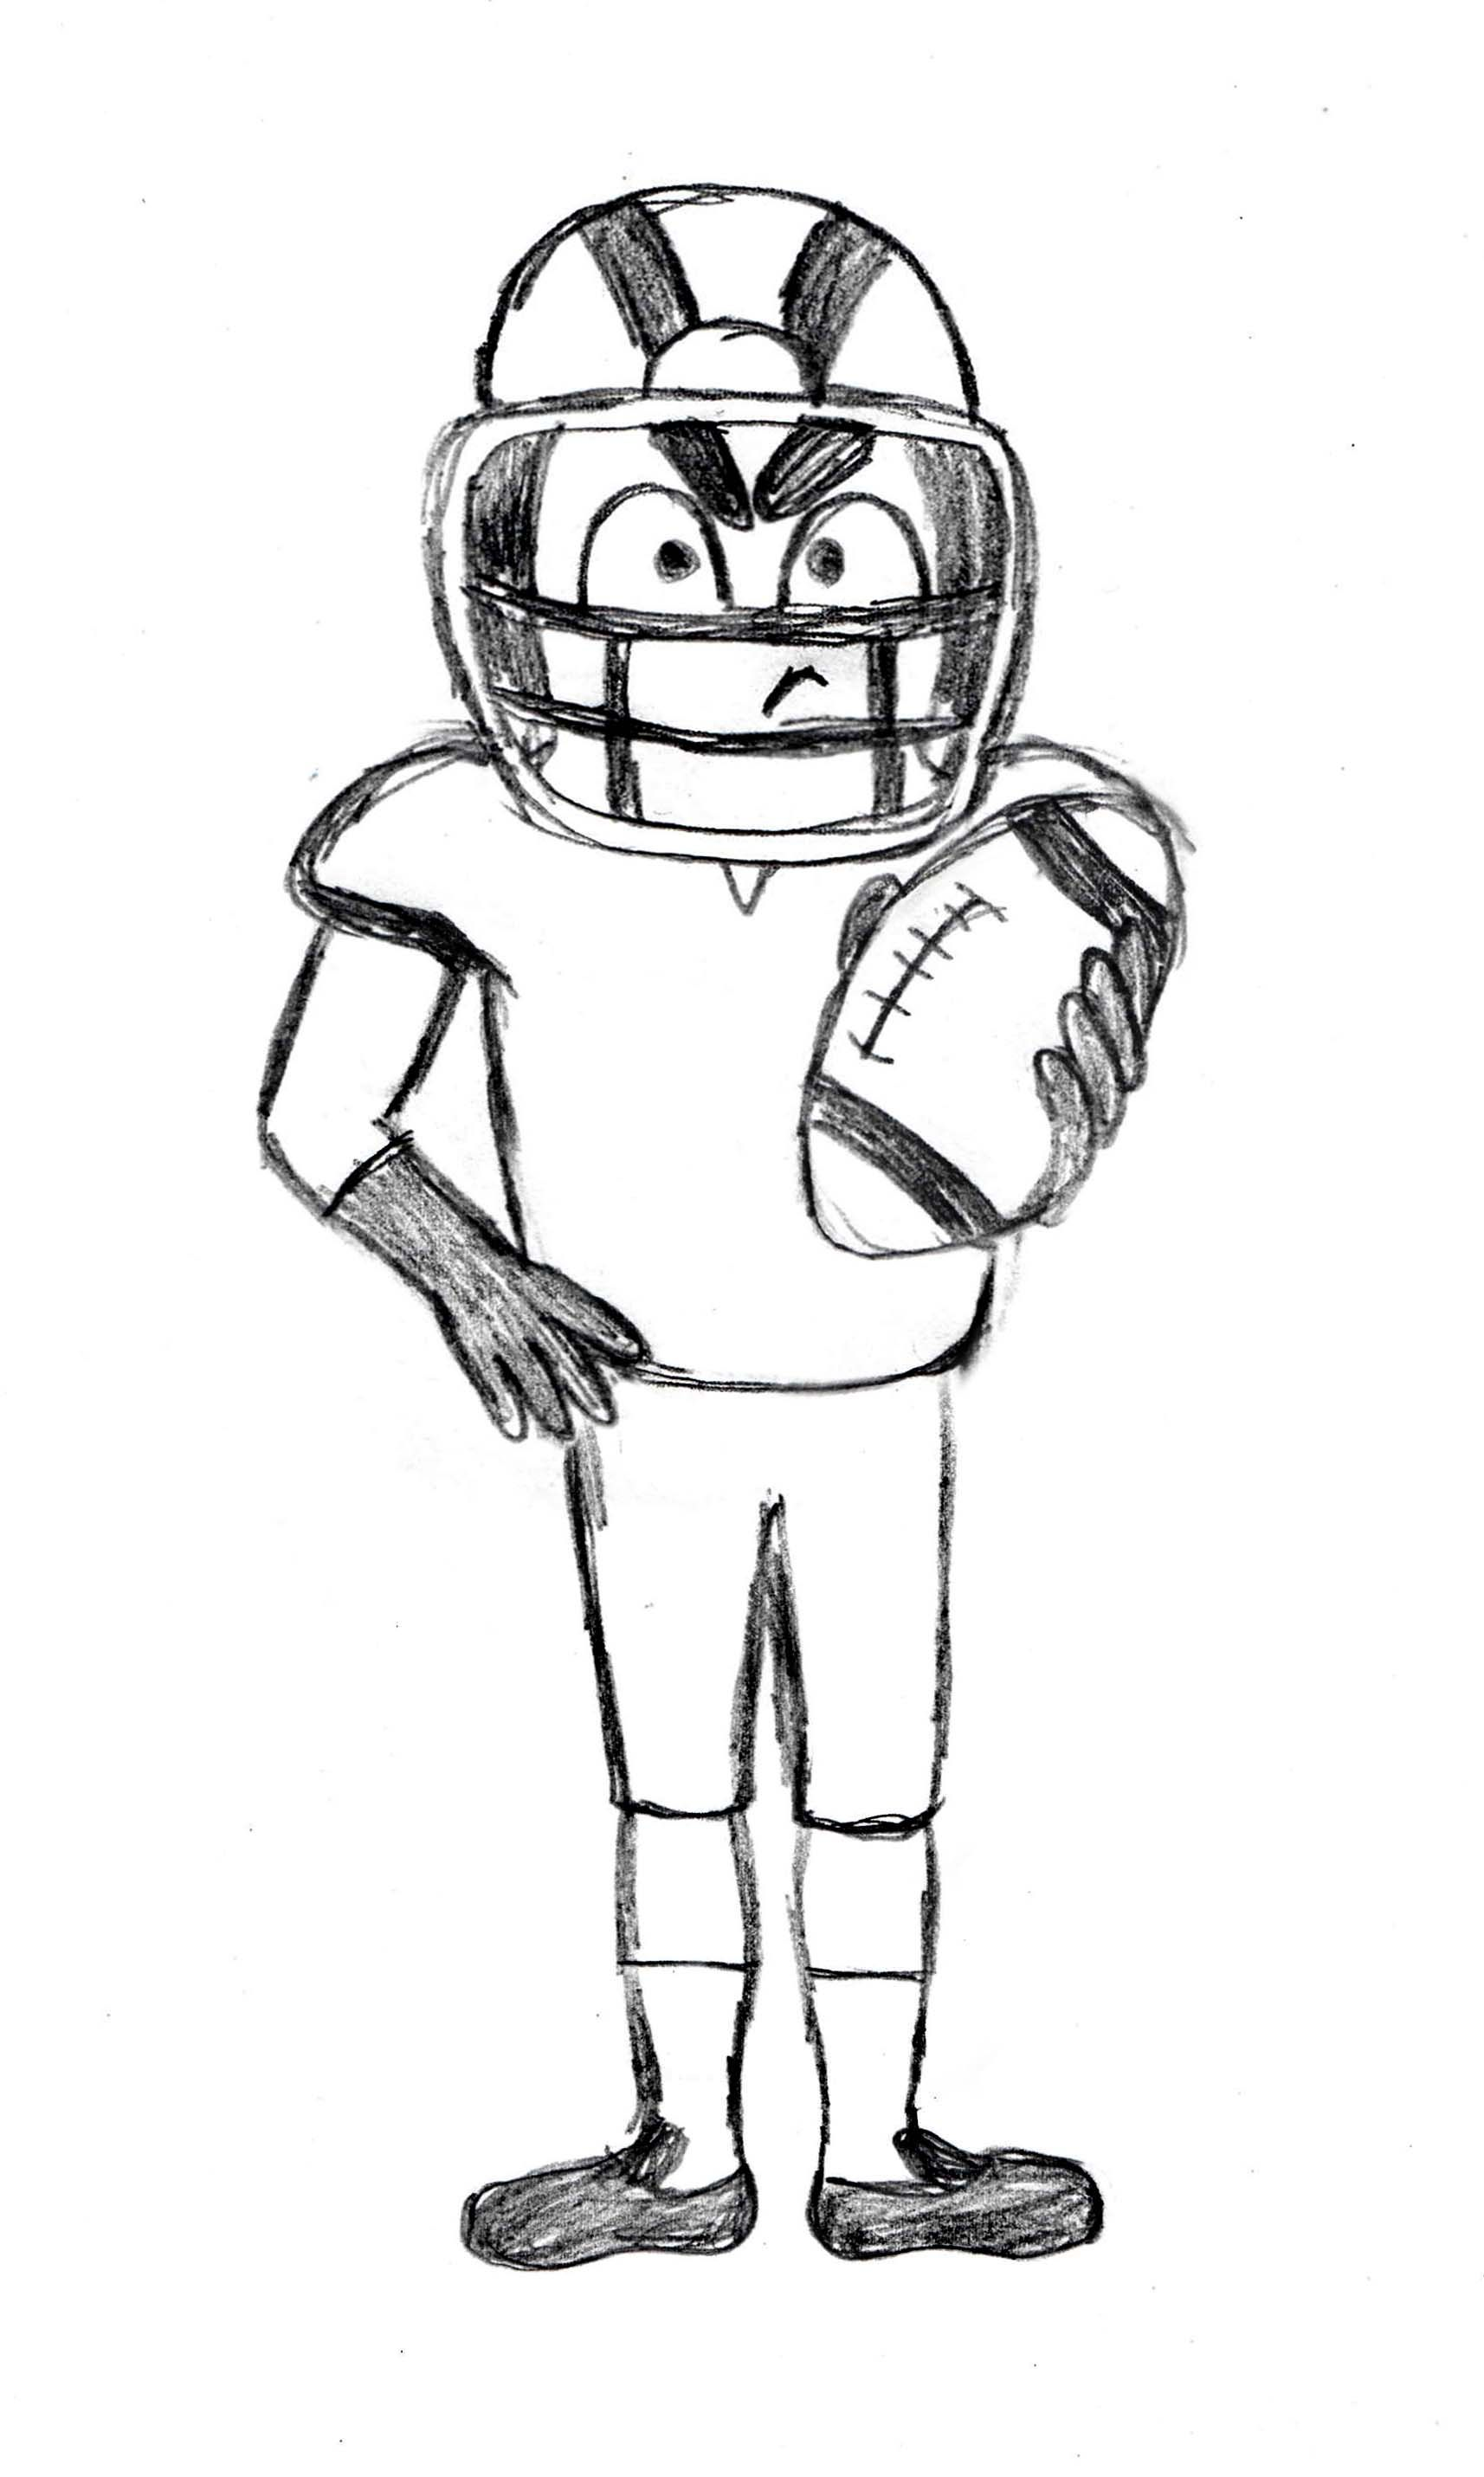 American Football Player Sketch Drawingmanuals